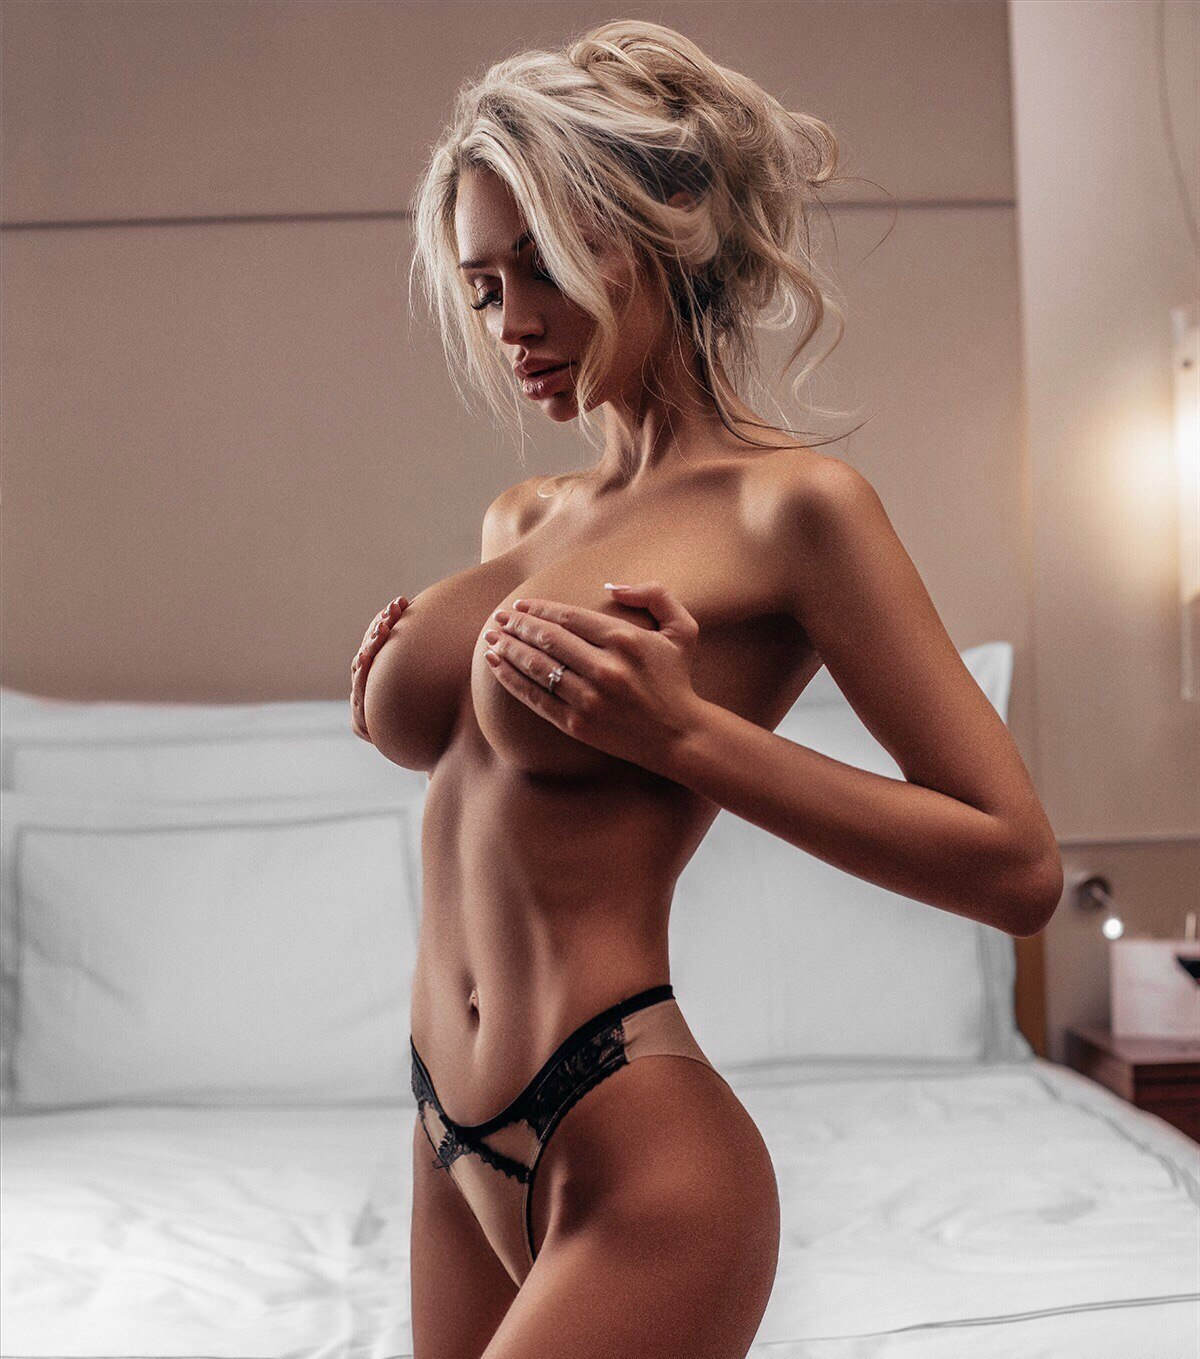 Marta Mayer